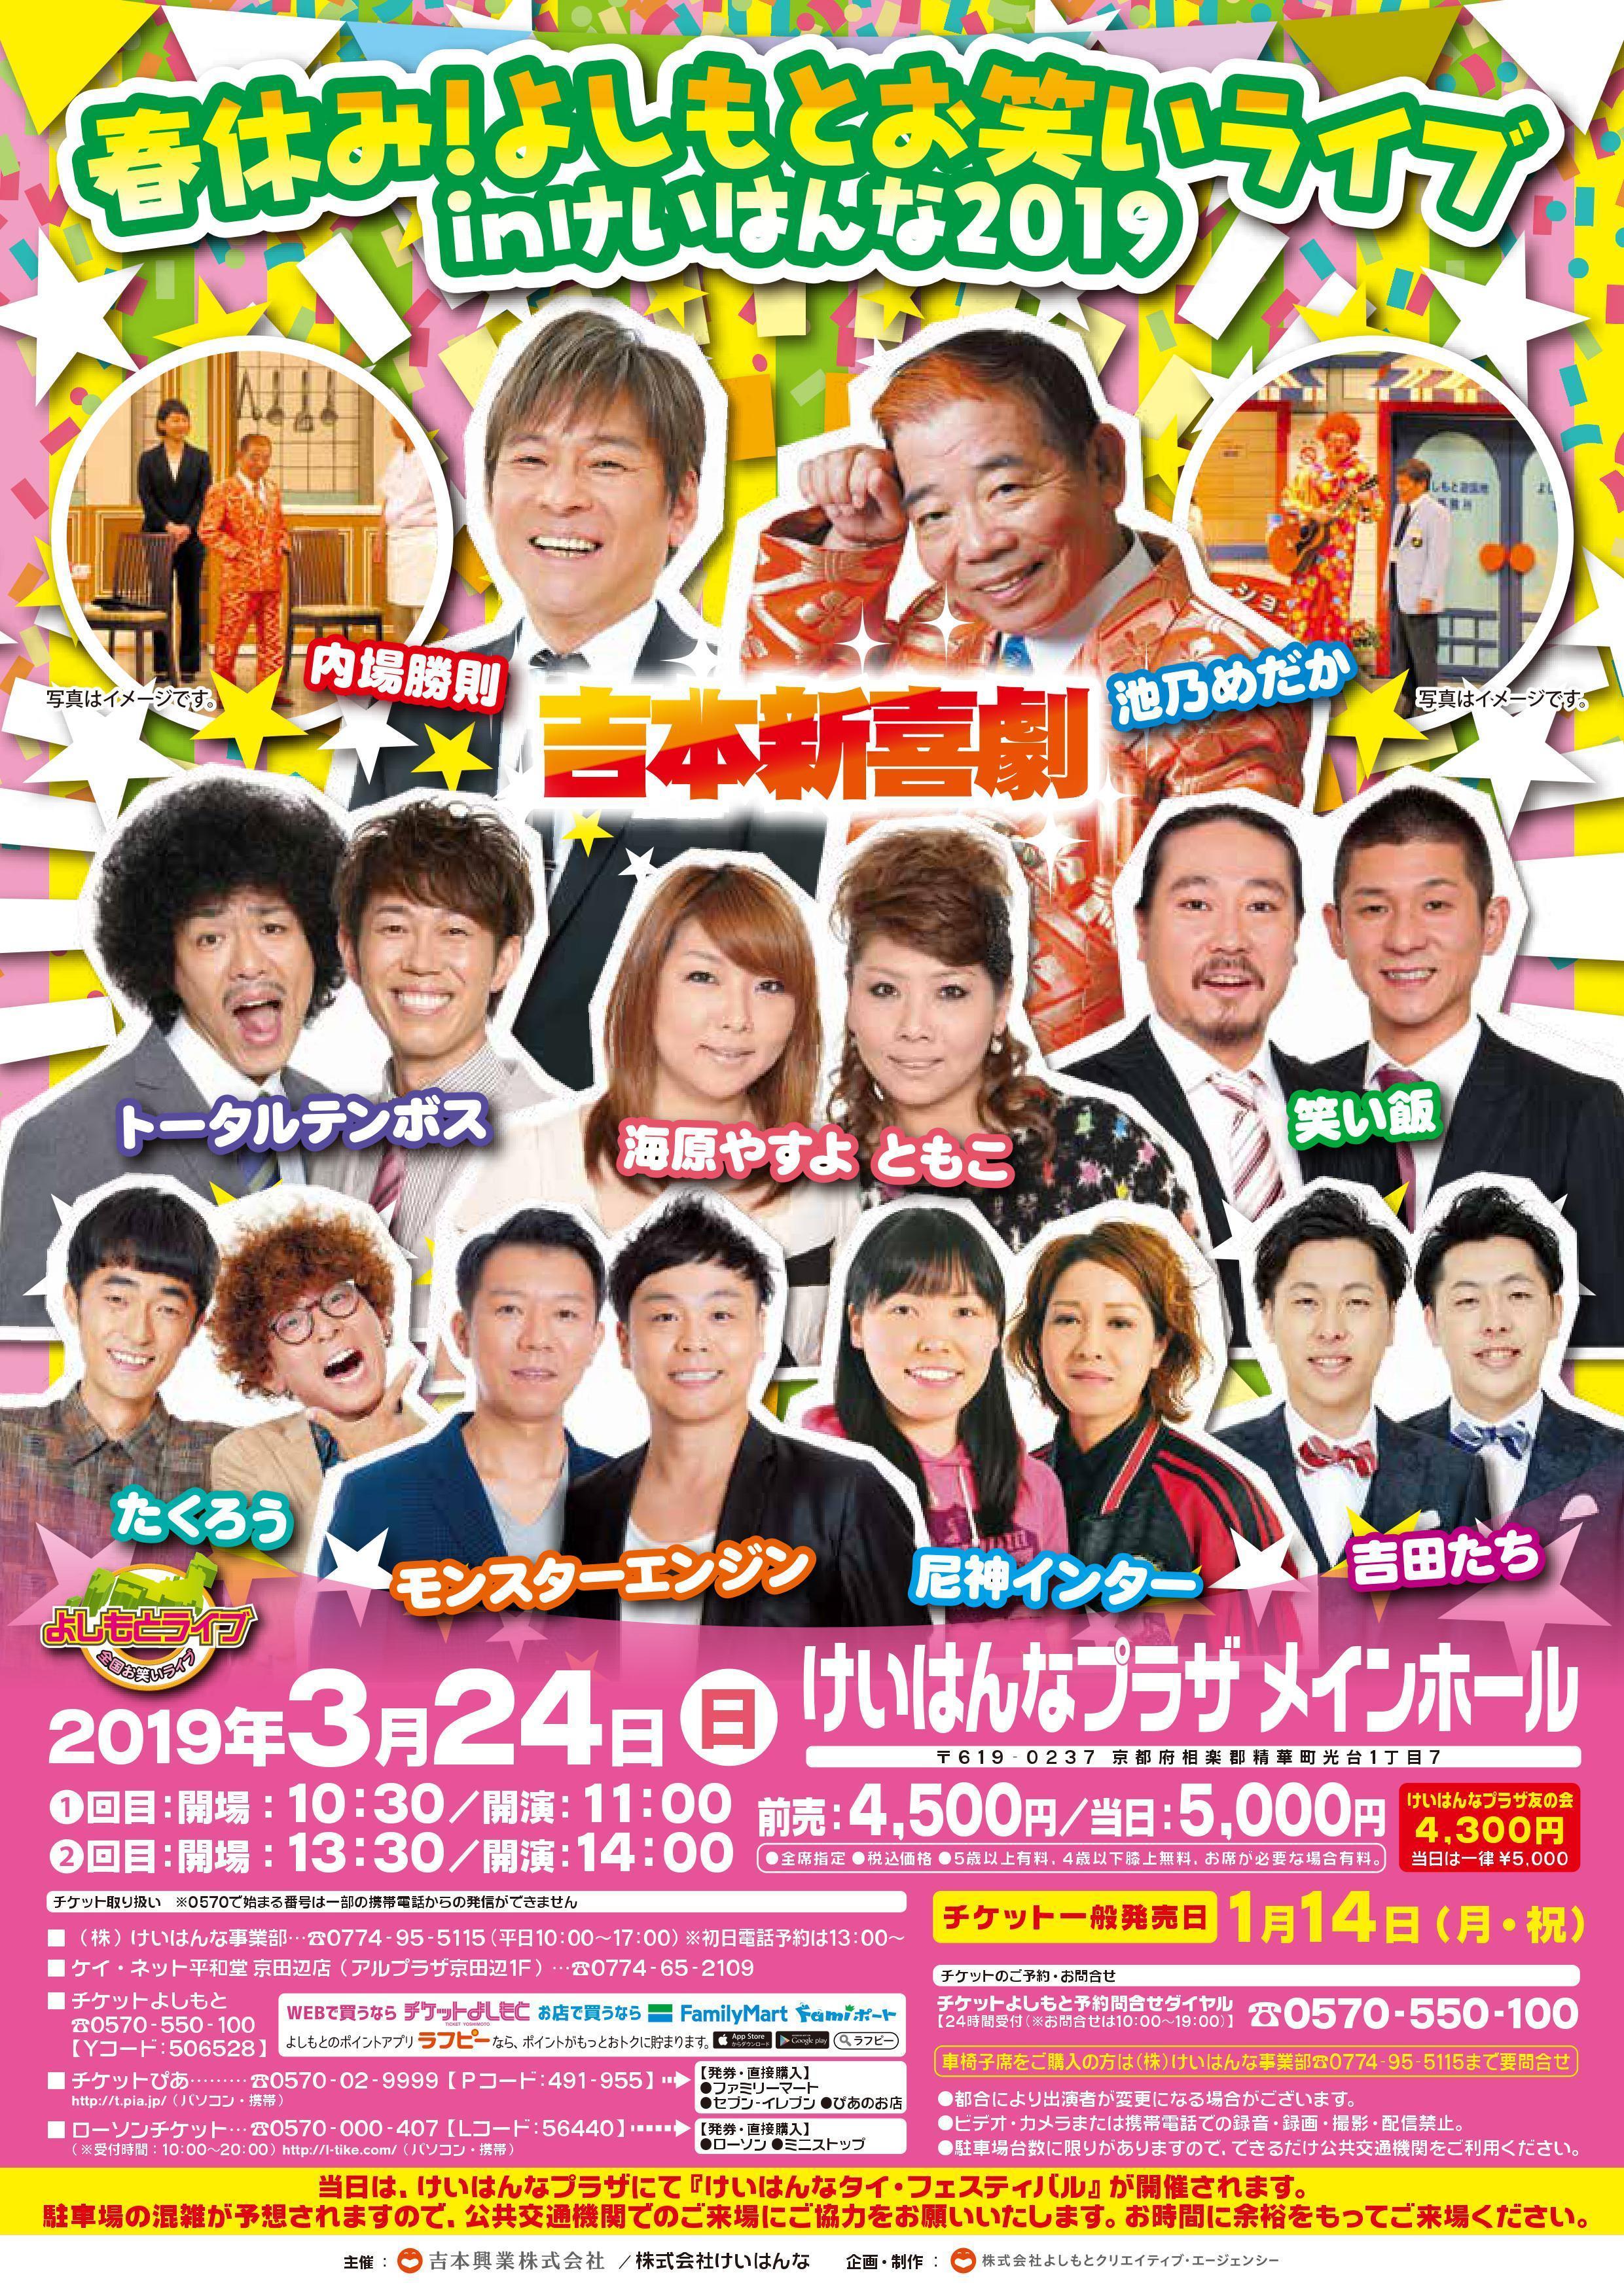 http://www.syumatsu.jp/20190108151107-d0f5ec417eb55a86255b29f84282f56c6b5001f5.jpg